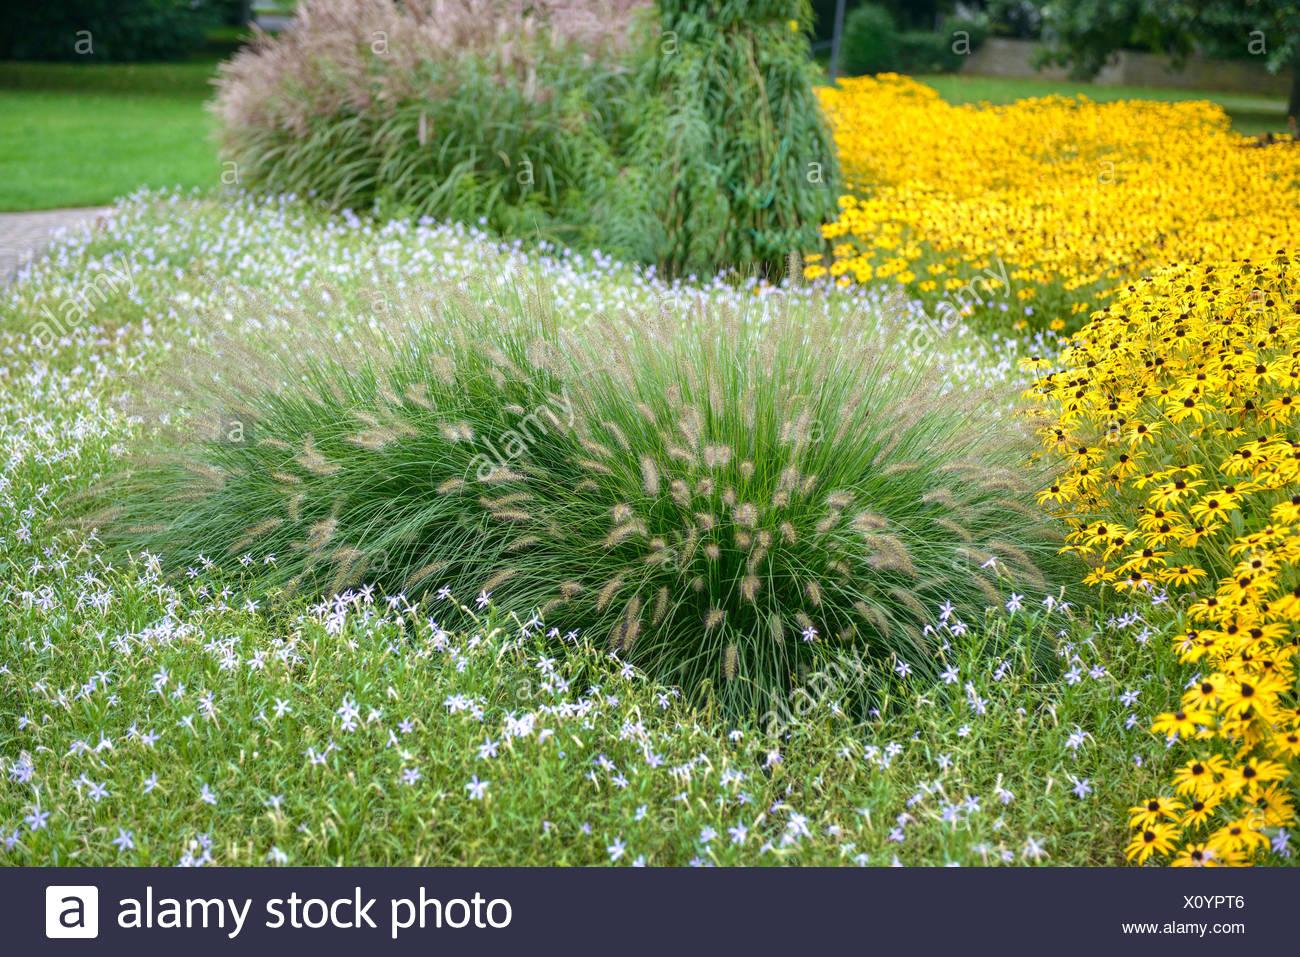 fountain grass (Pennisetum alopecuroides 'Hameln', Pennisetum alopecuroides Hameln), cultivar Hameln, with Rudbeckia, Germany, North Rhine-Westphalia - Stock Image